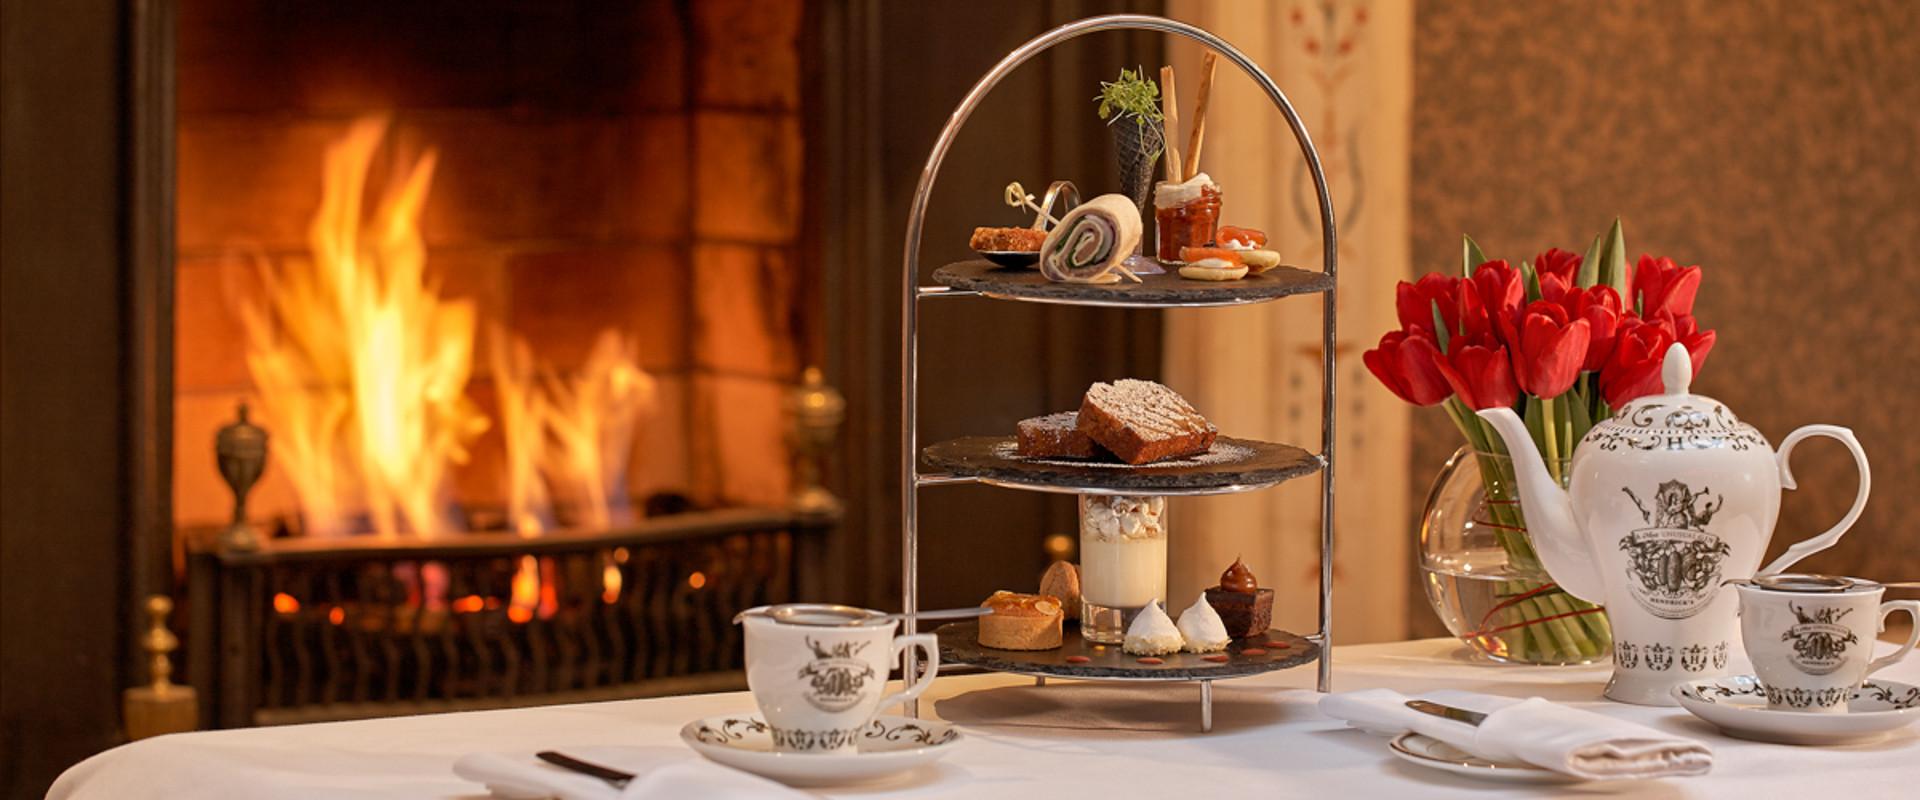 The Atrium Lounge Fireplace- Afternoon Tea Setting